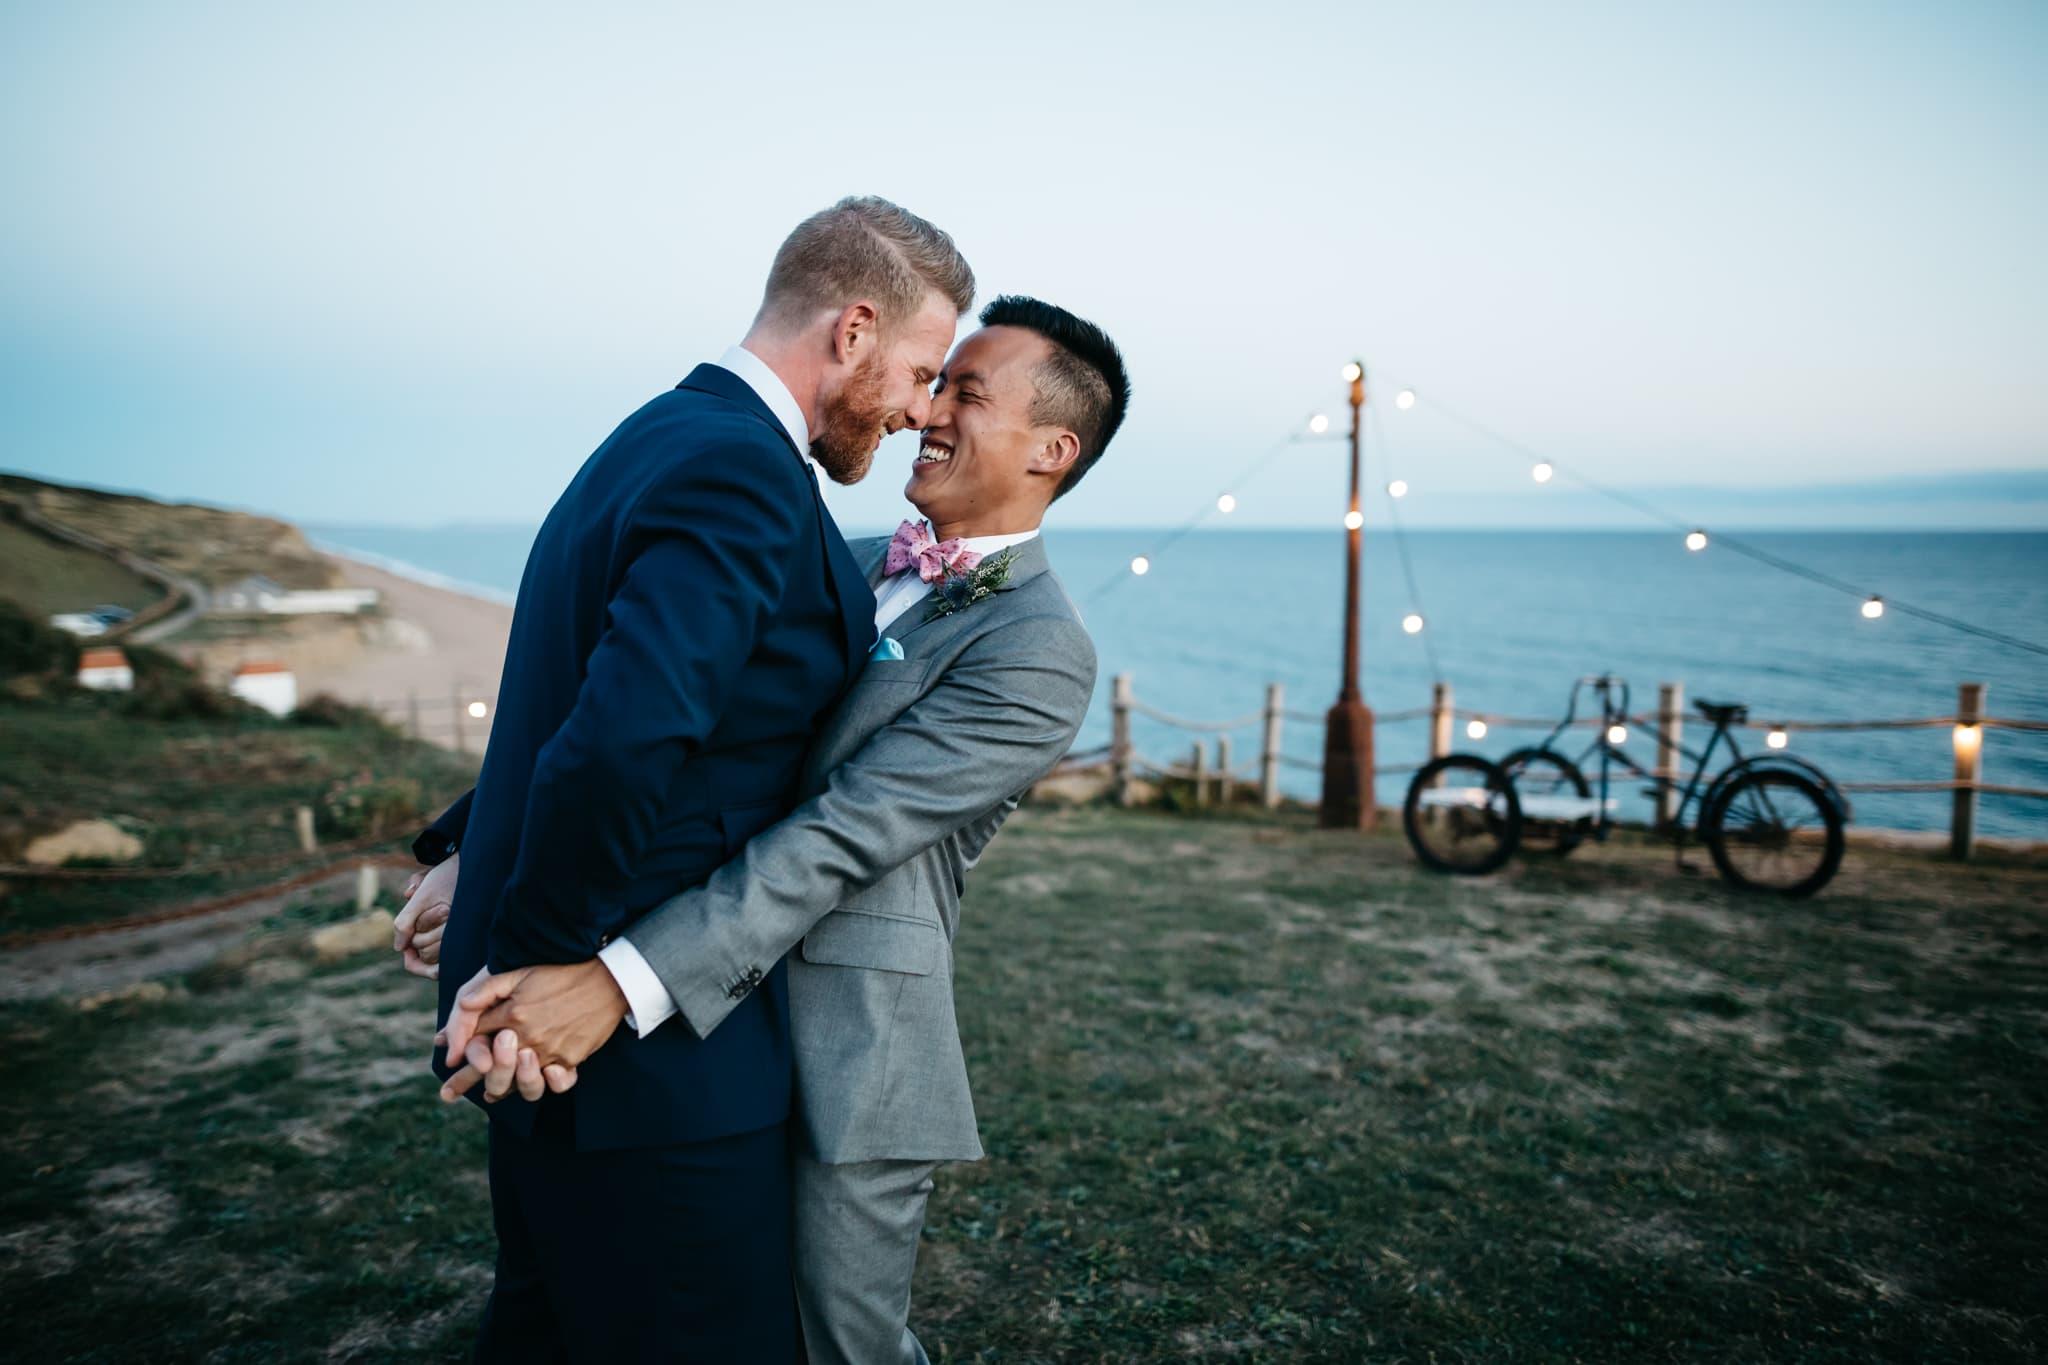 Same sex couple at their wedding